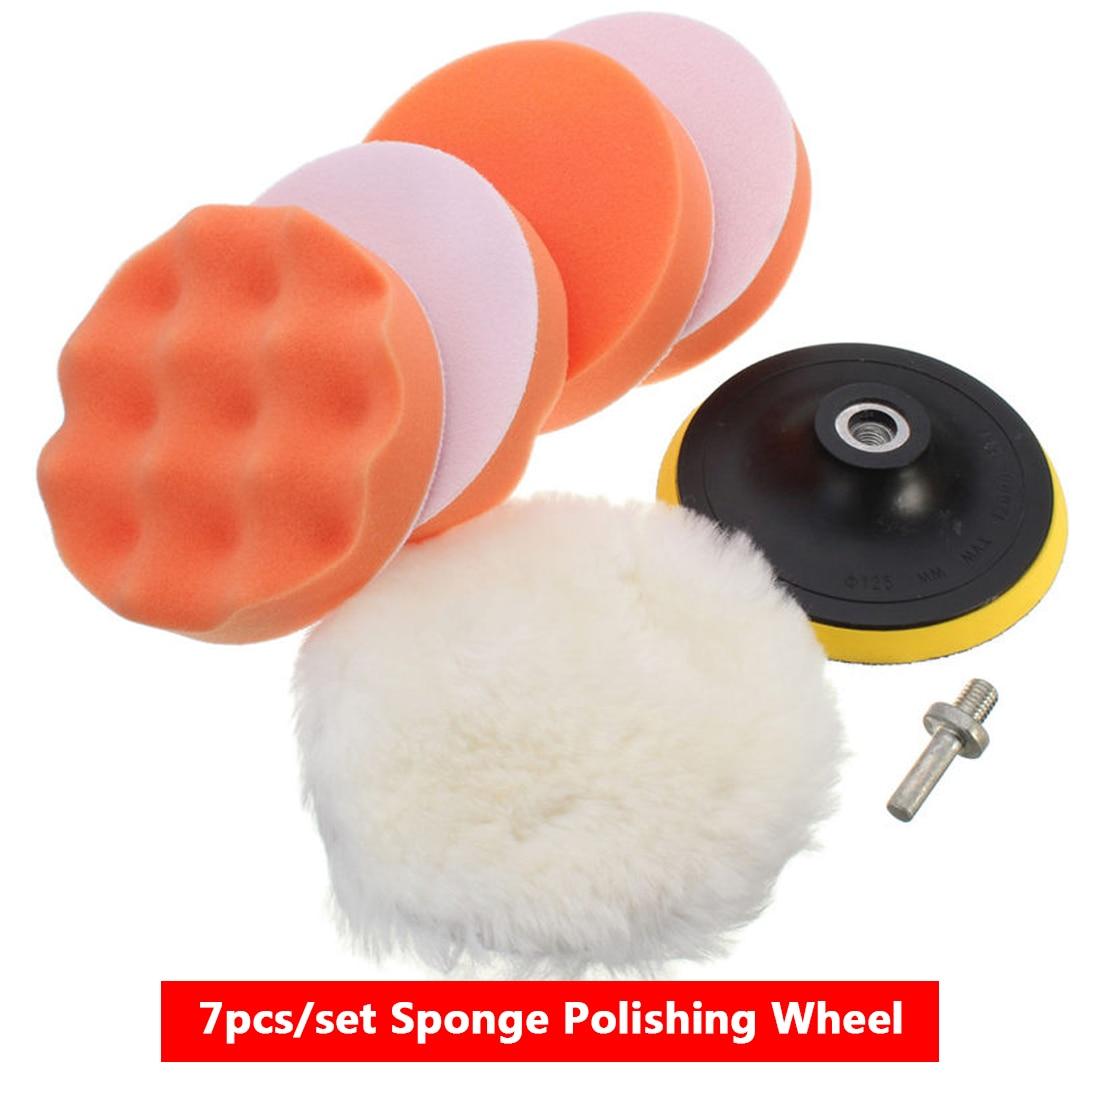 3inch Buffing Pad Auto Car Polishing Pad Kit Buffer + Drill Adapter M10 For Glass/Car Polisher Electric Drill 7pcs/set